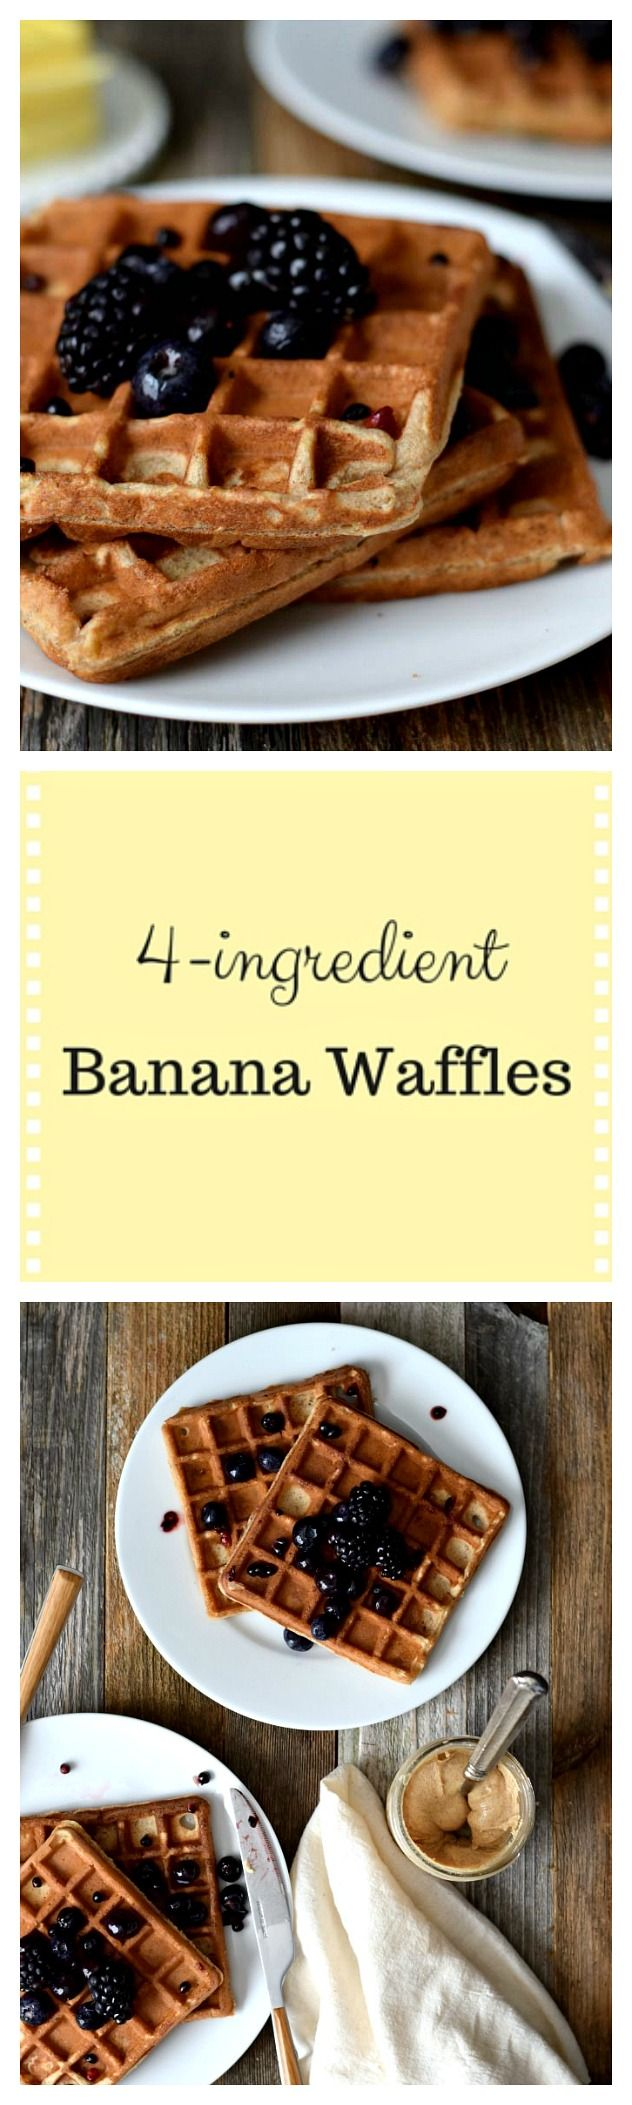 Flourless 4-Ingredient banana waffles: Just banana, eggs, nut butter and baking soda!